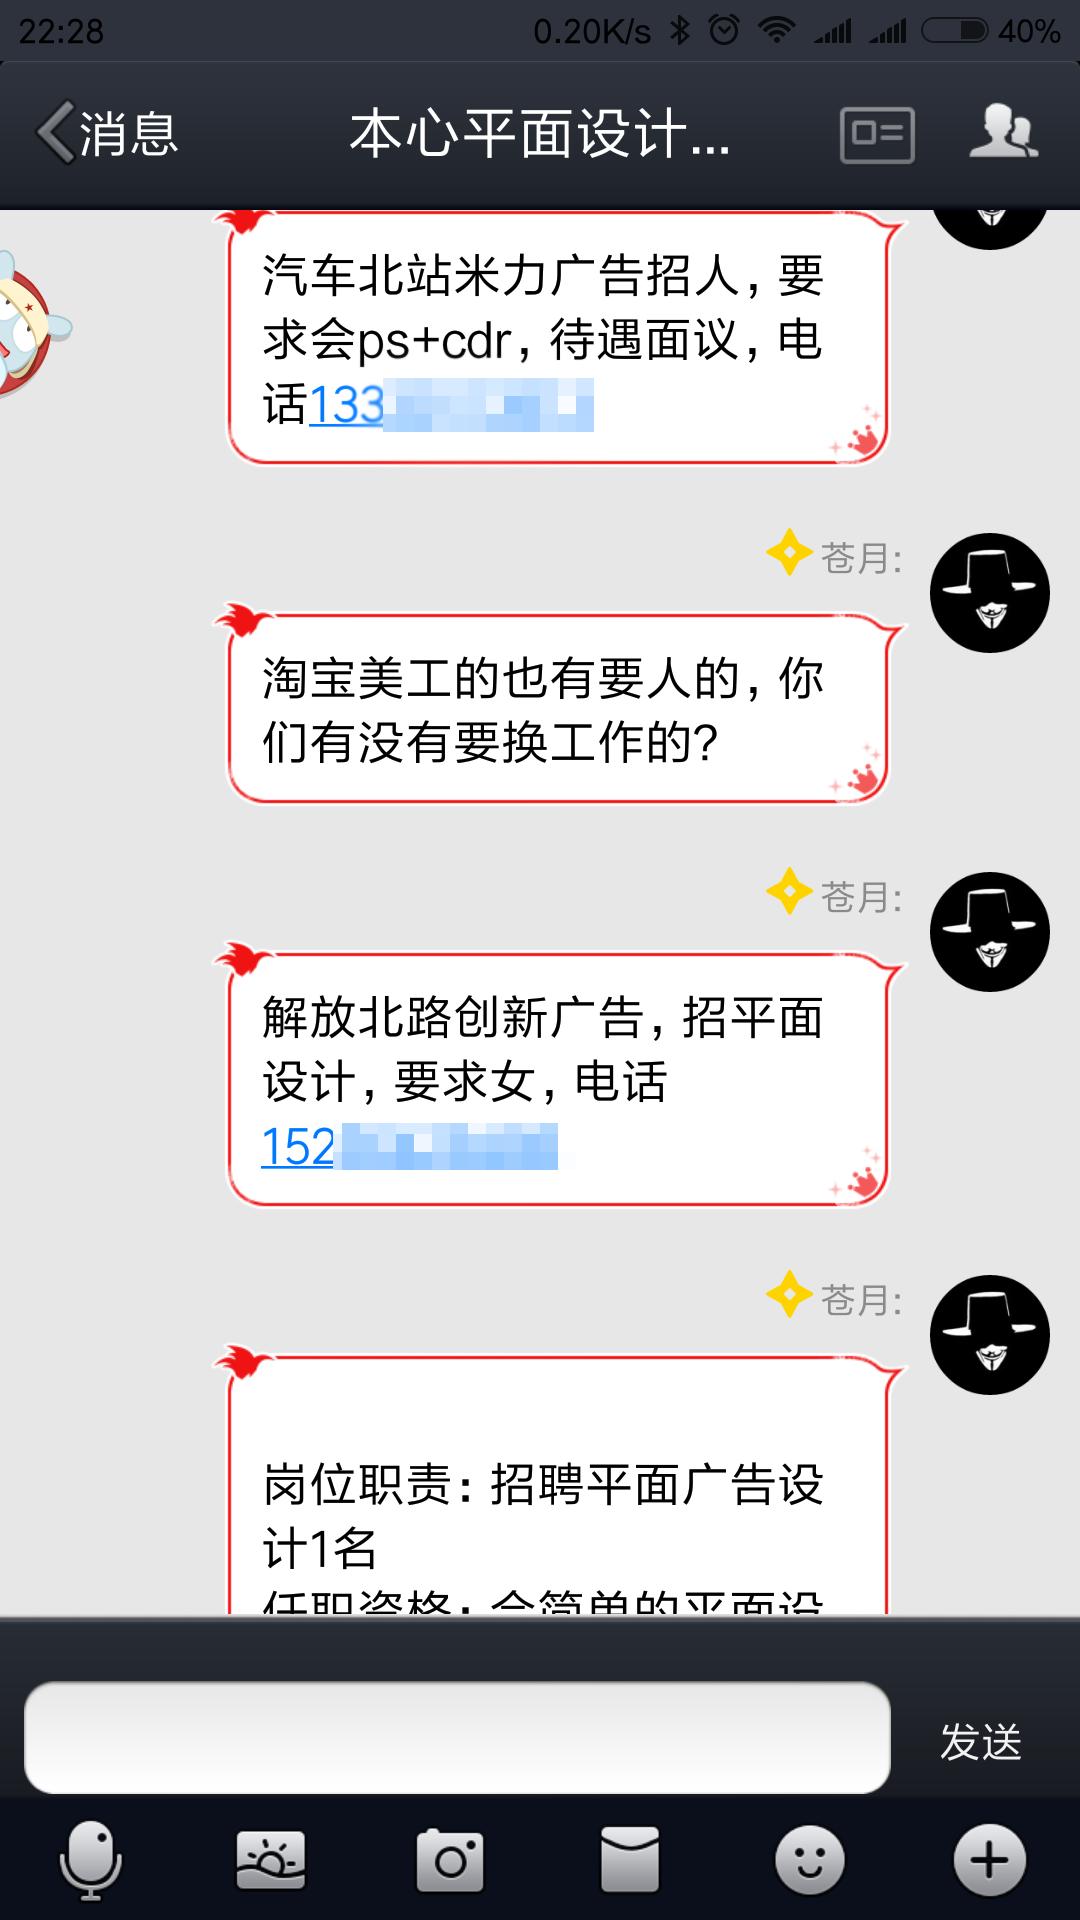 Screenshot_2017-02-03-22-28-01-604_com.tencent.mo.png